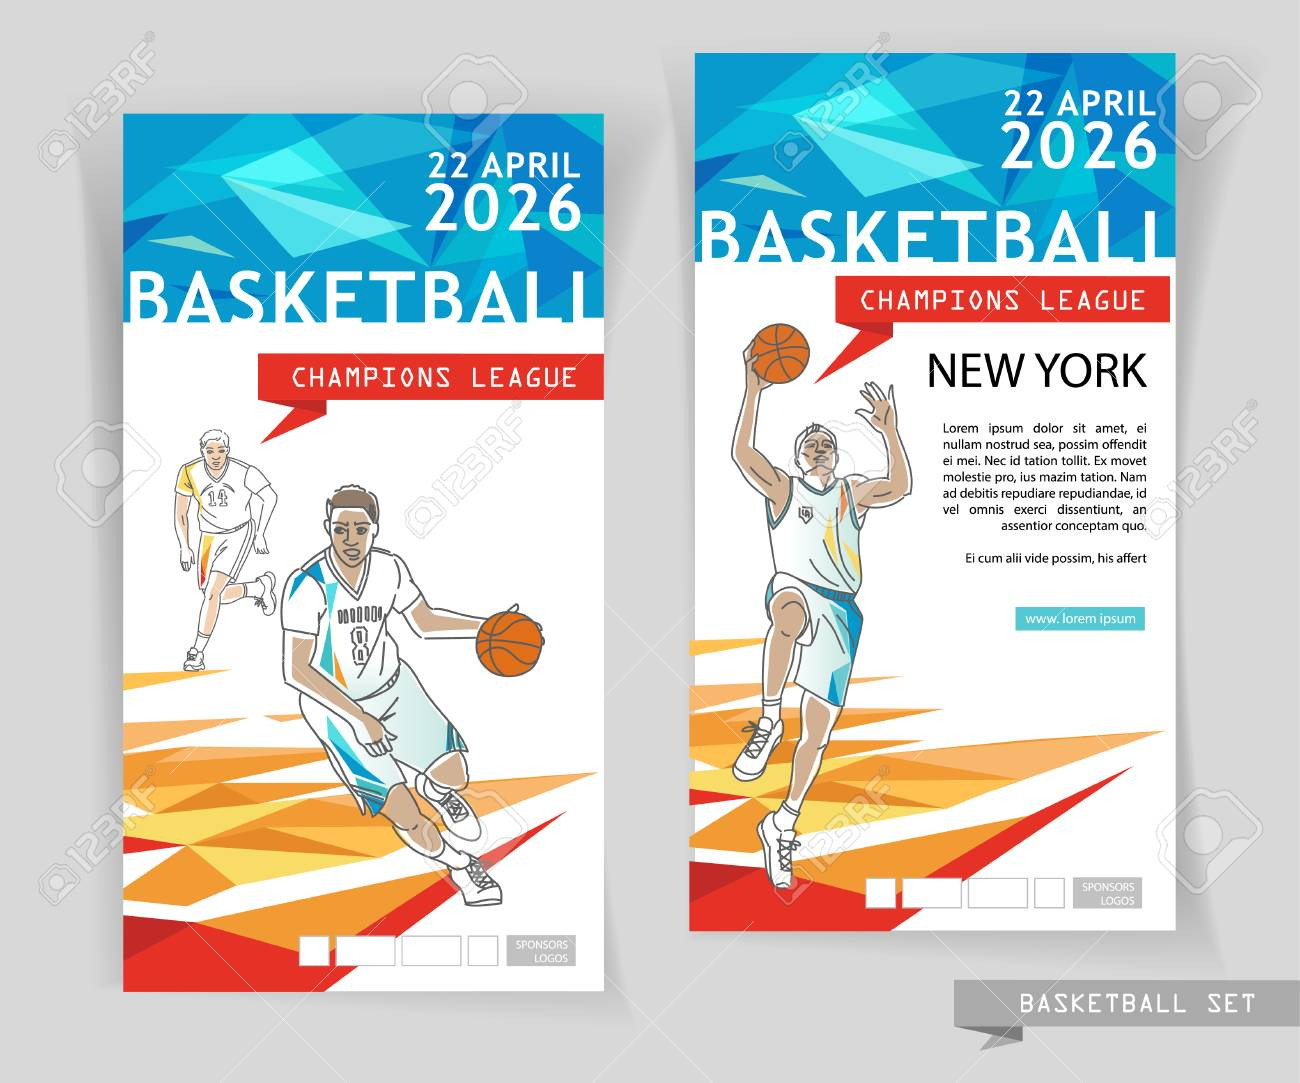 Berühmt Basketball Turnier Flyer Vorlage Fotos - Entry Level Resume ...